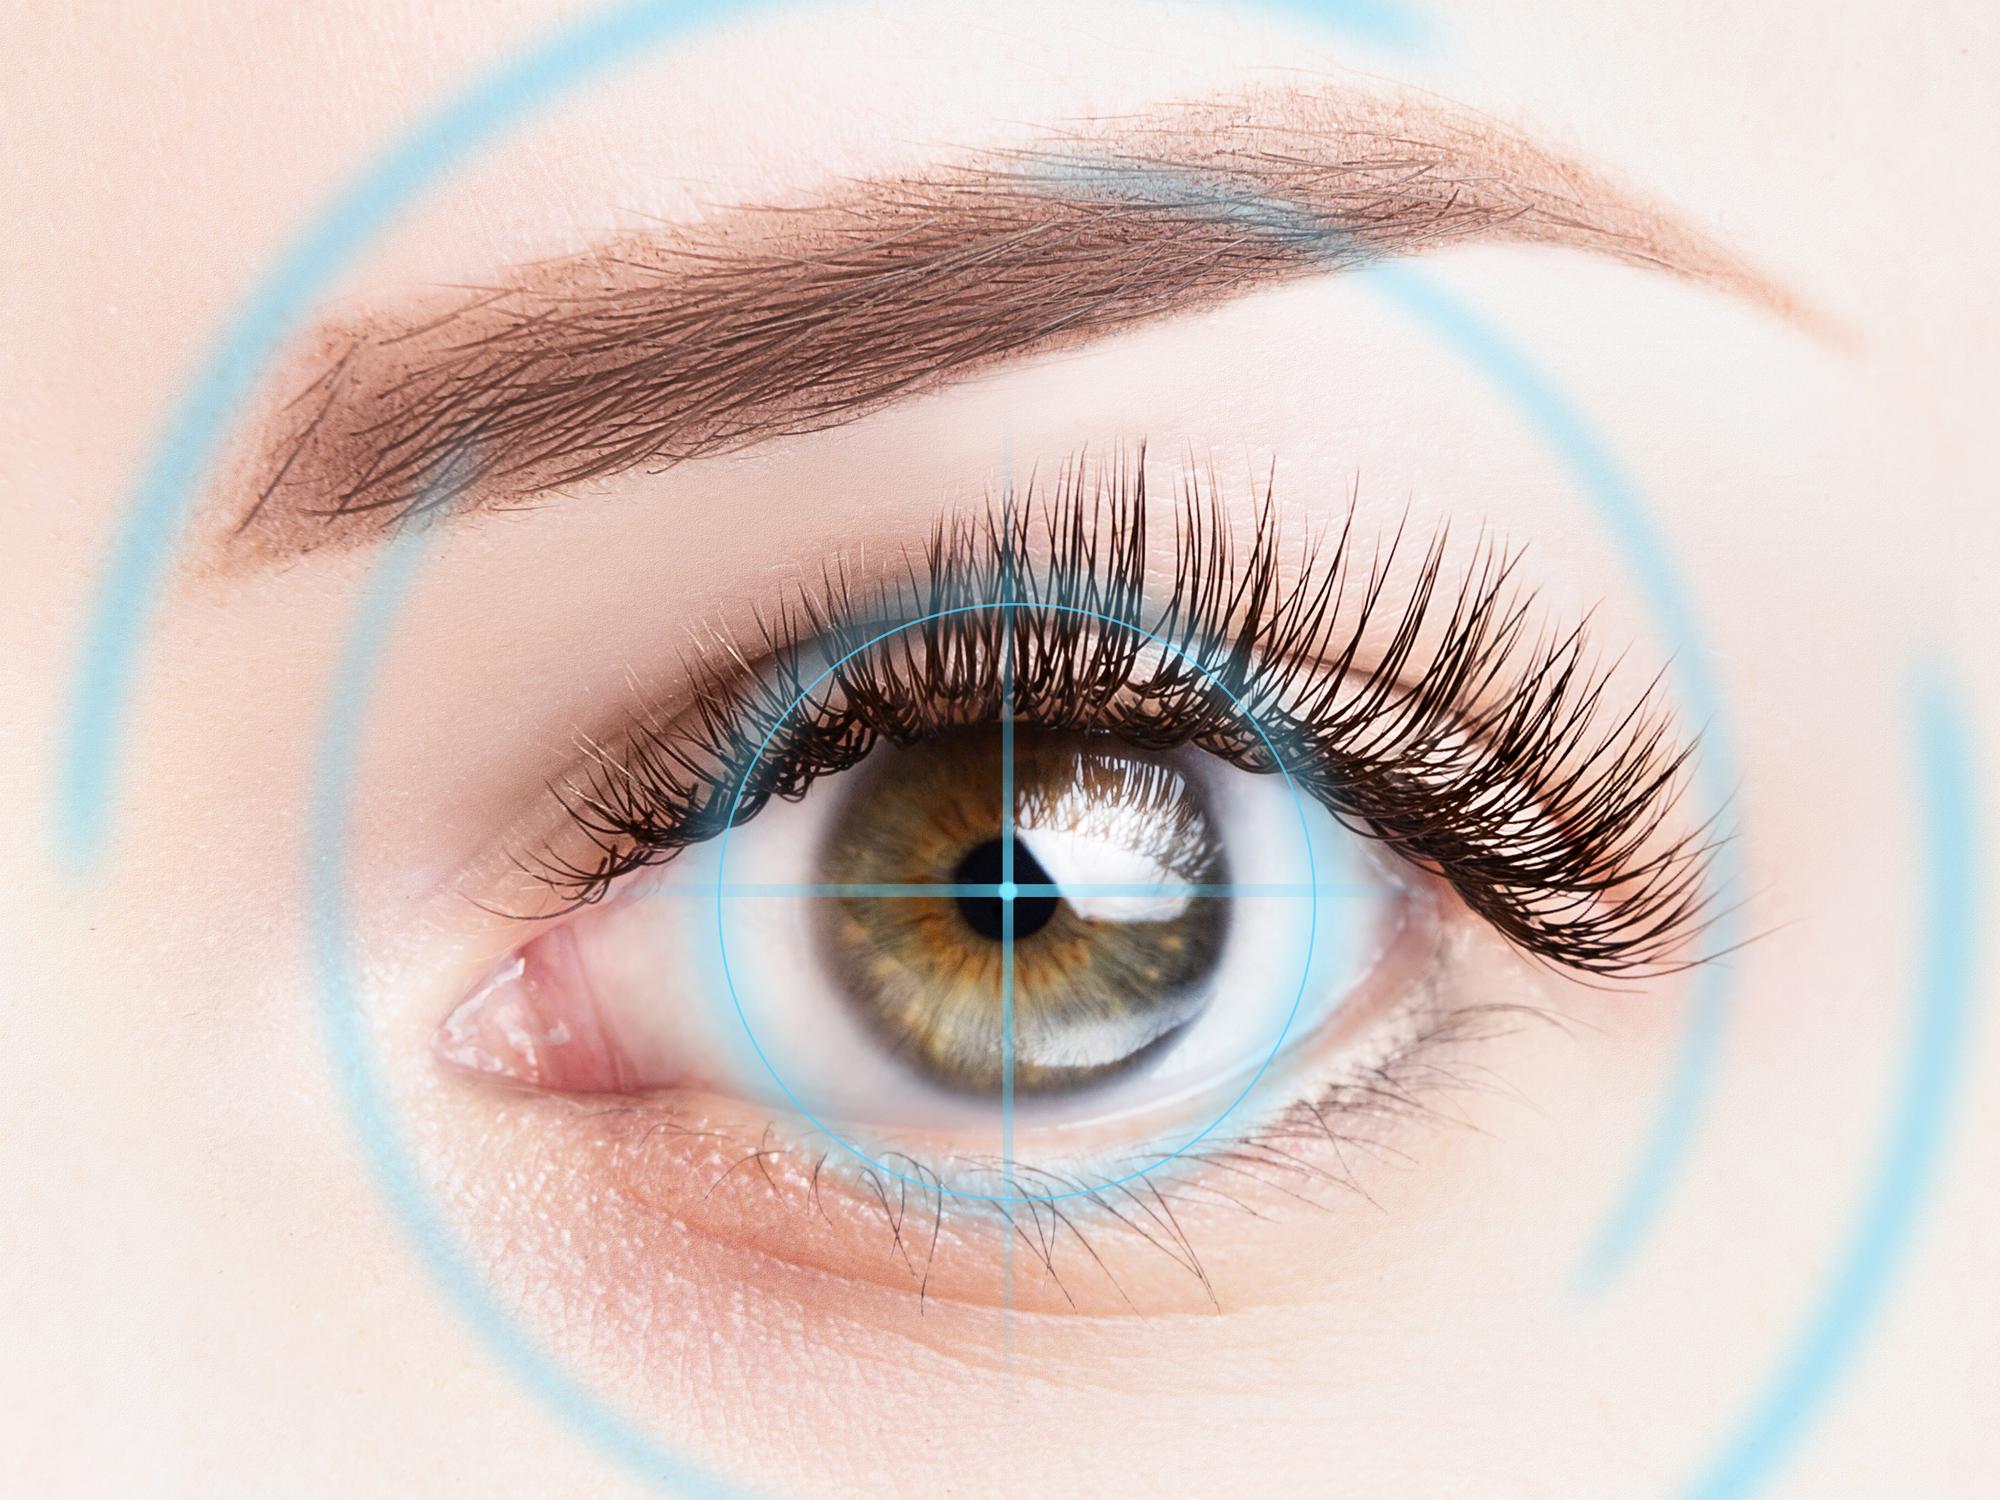 How Long Does LASIK Eye Surgery Last?